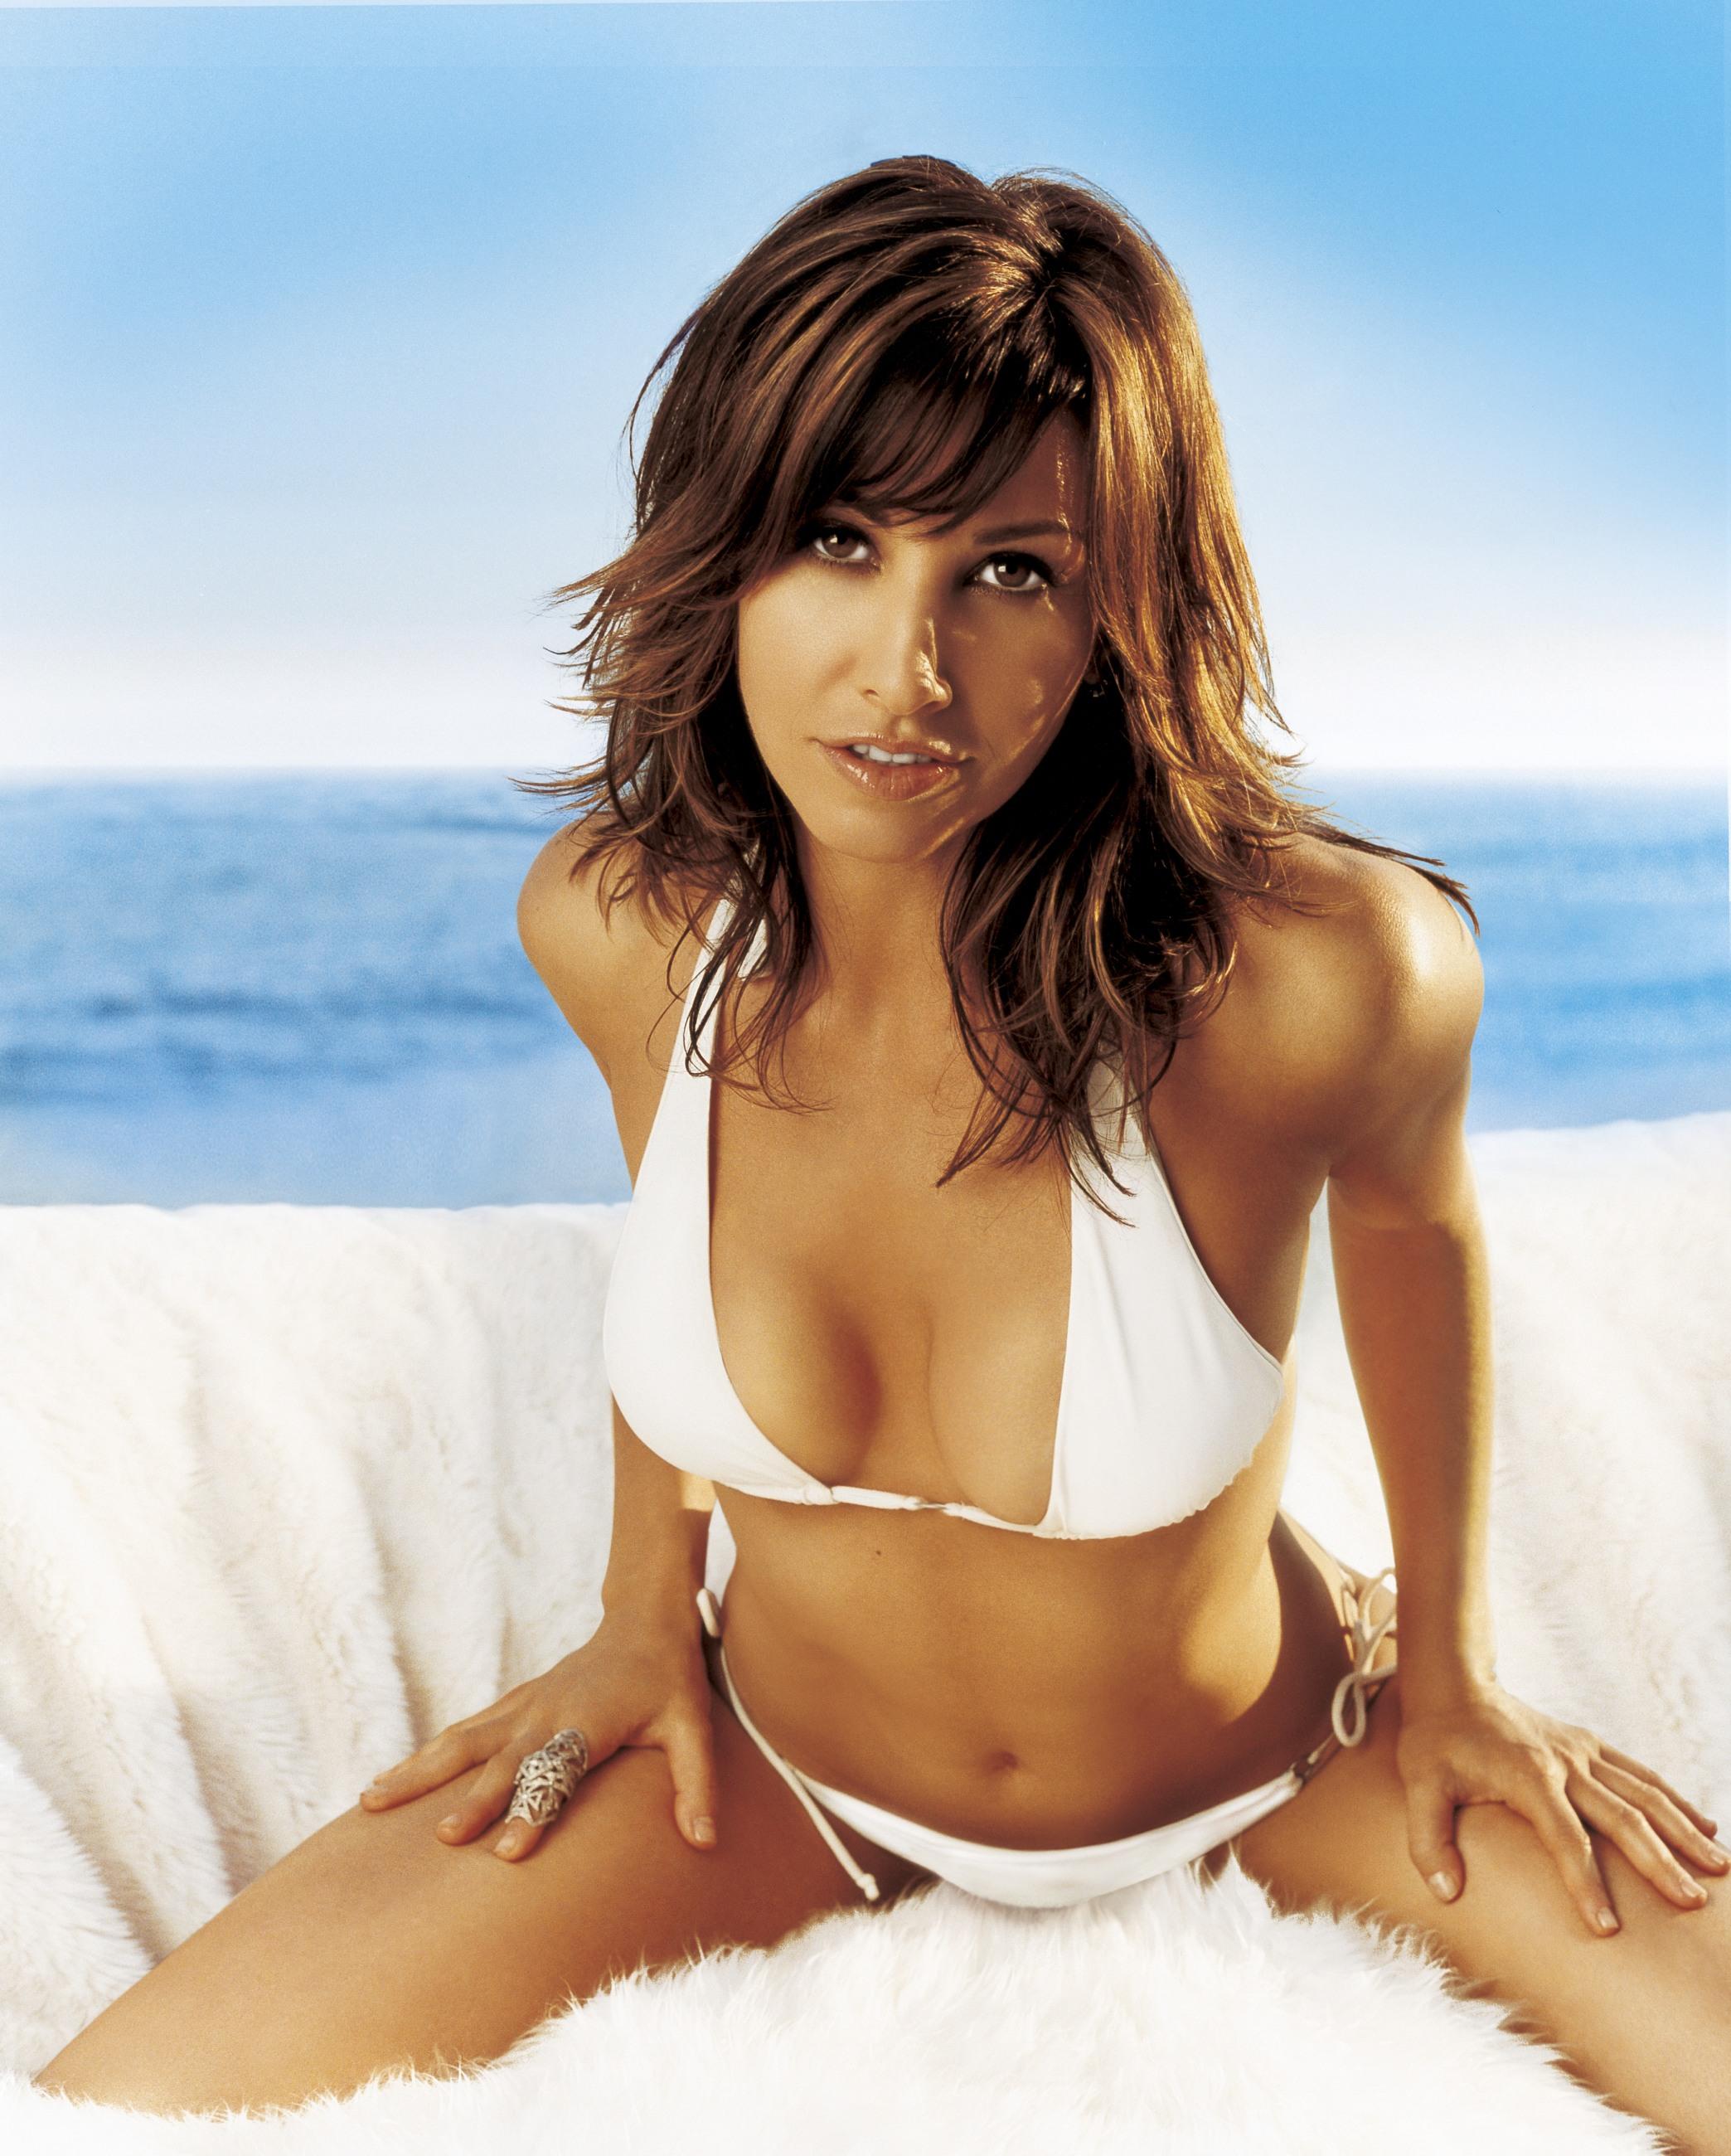 Джина Гершон фото бикини Gina Gershon photo bikini